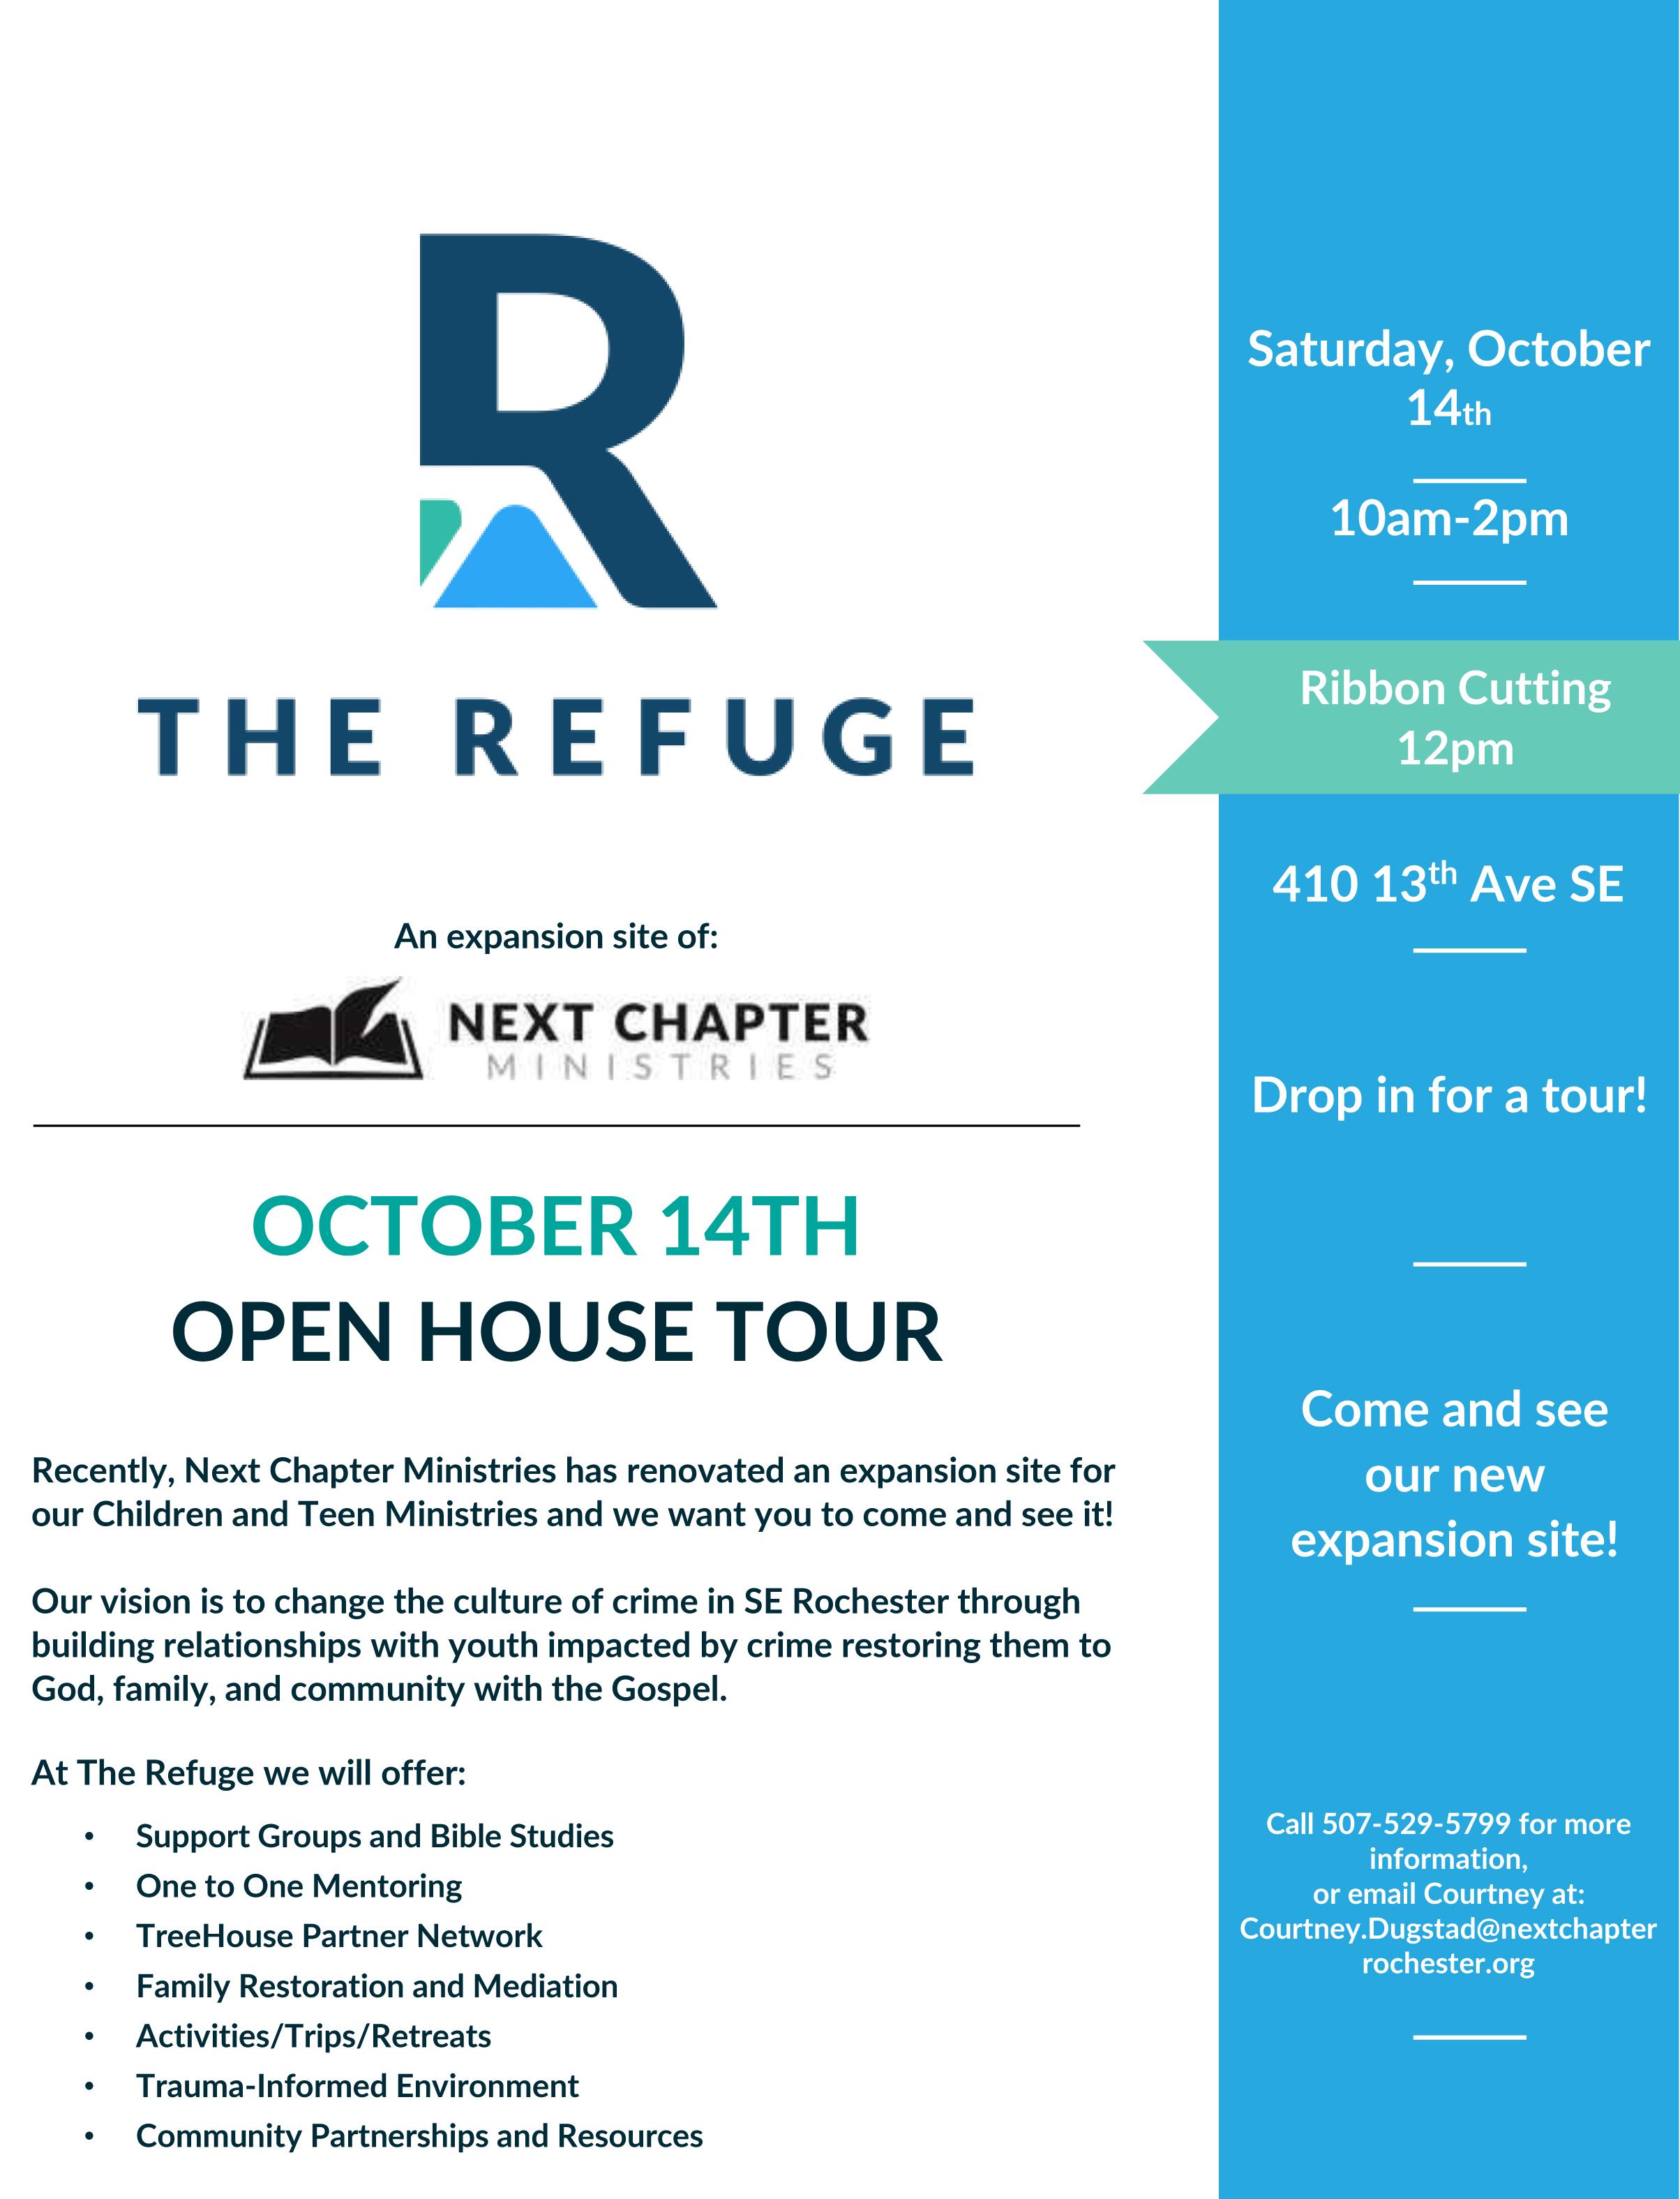 RefugeOpenHouseFlyerRibbon.jpg